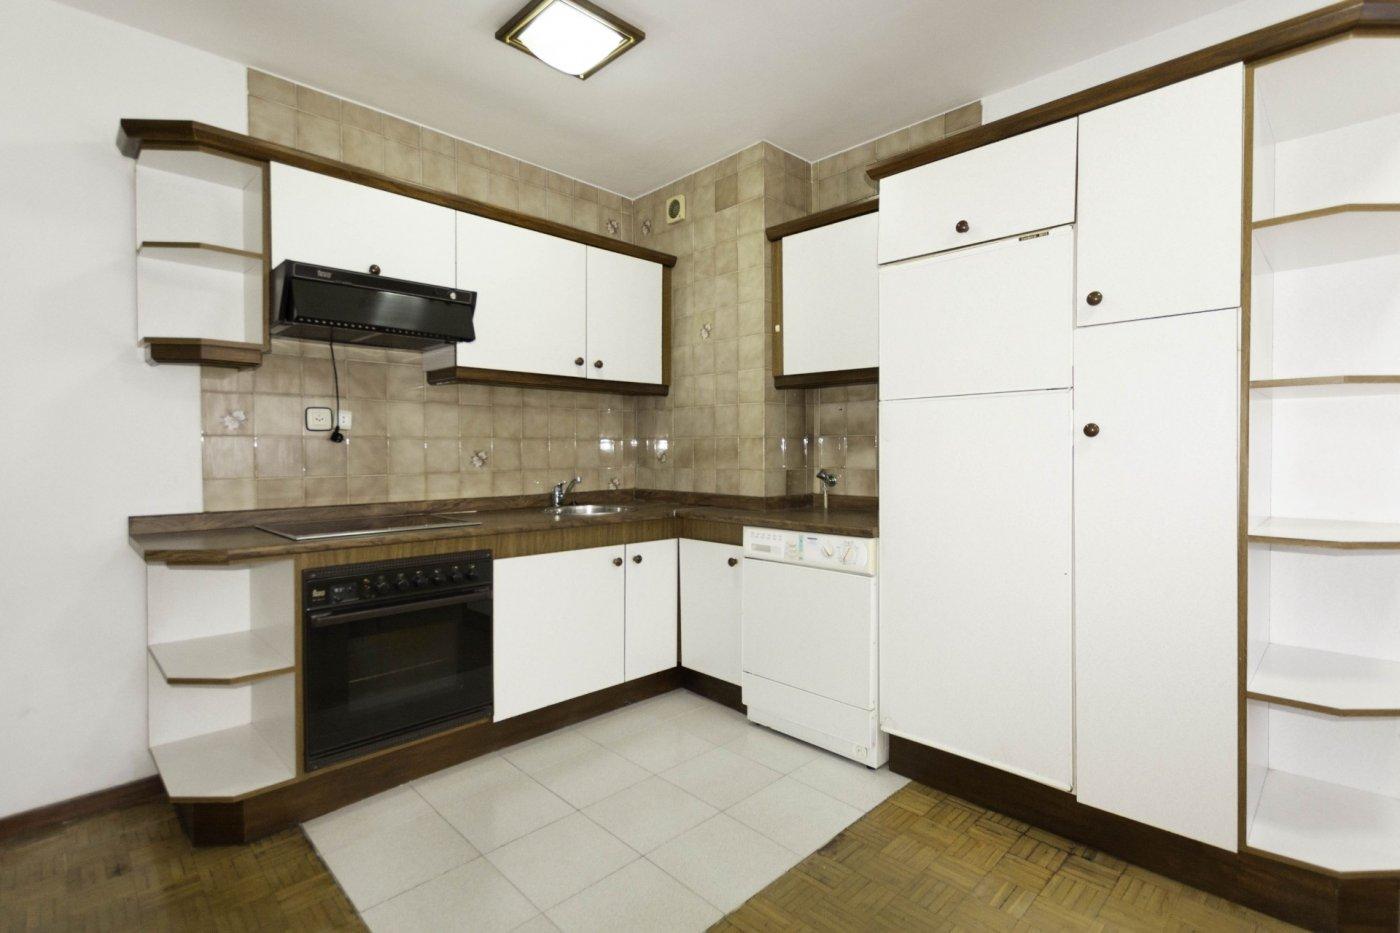 Apartamento en vallobin - imagenInmueble22